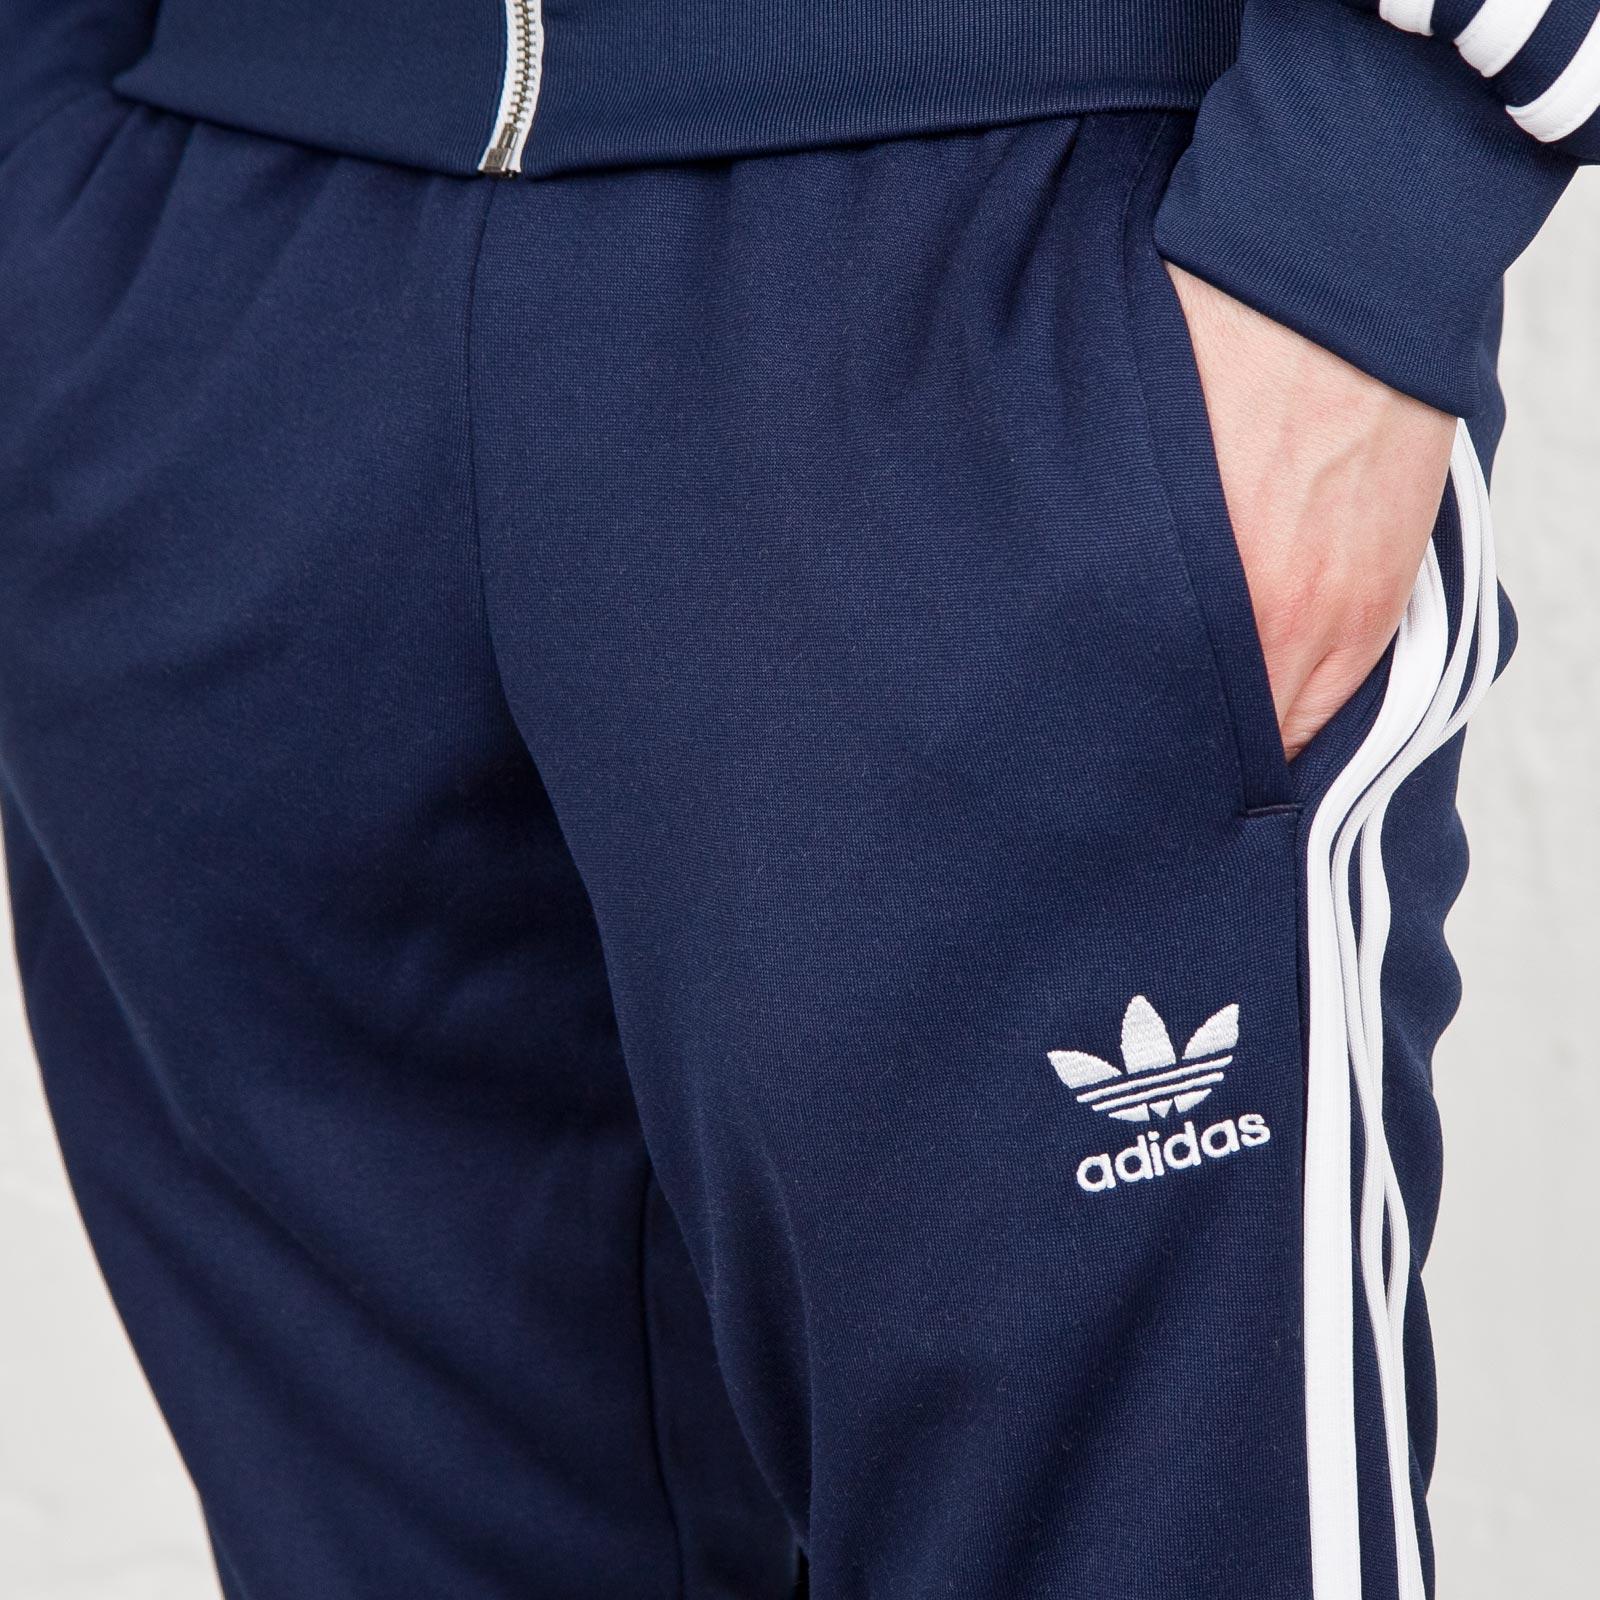 adidas Originals Superstar Cuffed Track Pants | Black